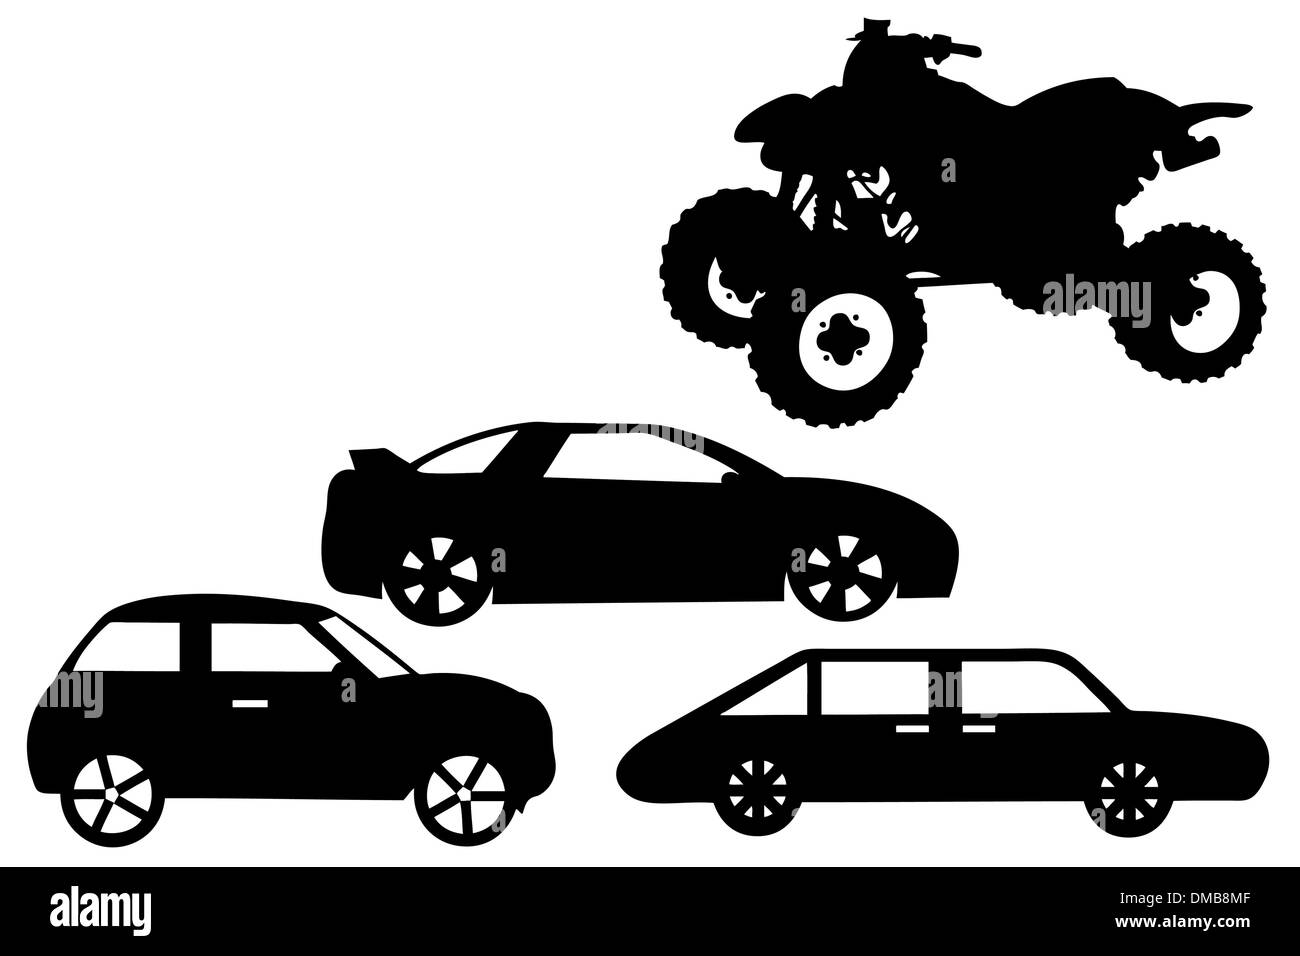 Collage con diferentes automóviles Imagen De Stock